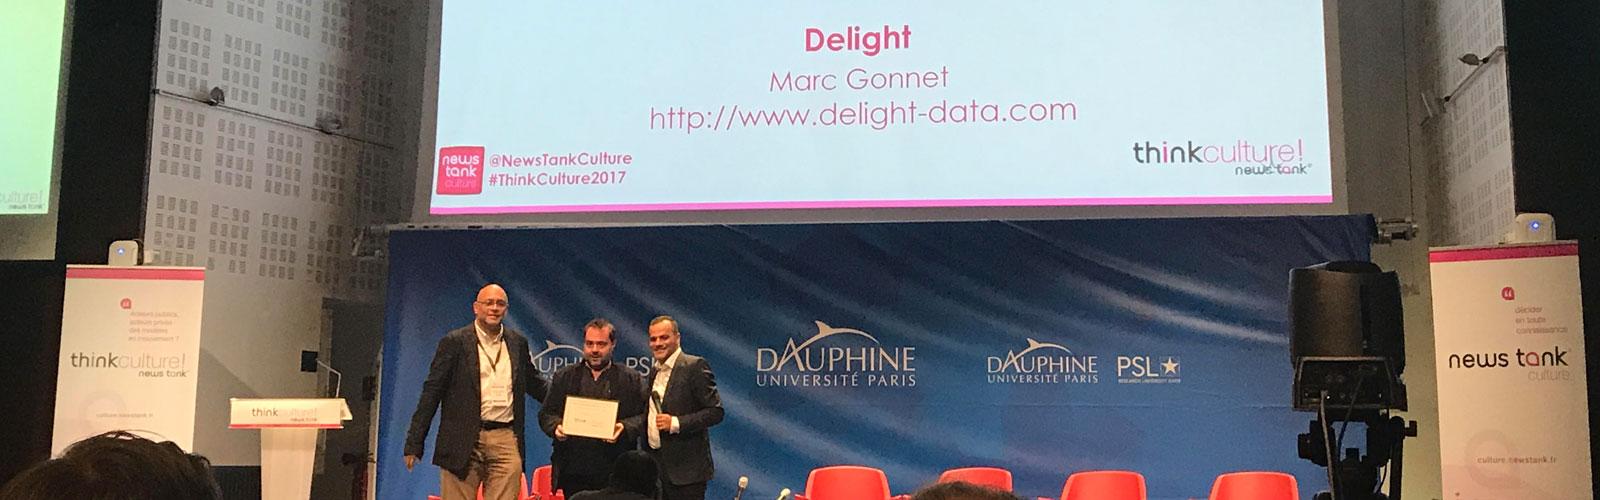 delight-prix-thinkculture2017